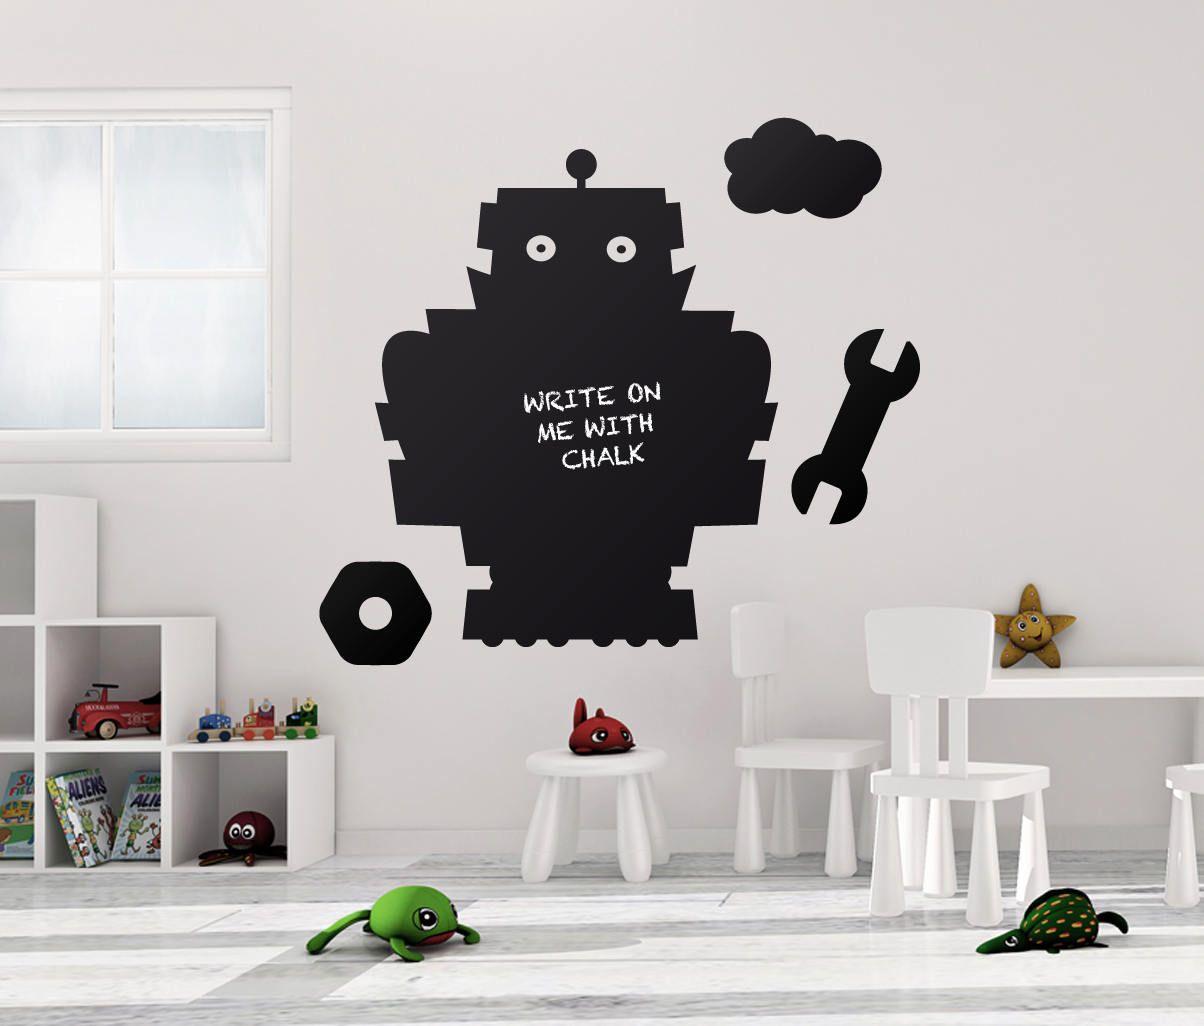 100x80cm chalkboard robot blackboard vinyl decor mural decals robo 100x80cm chalkboard robot blackboard vinyl decor mural decals robo wall sticker kids bedroomplayroom amipublicfo Images